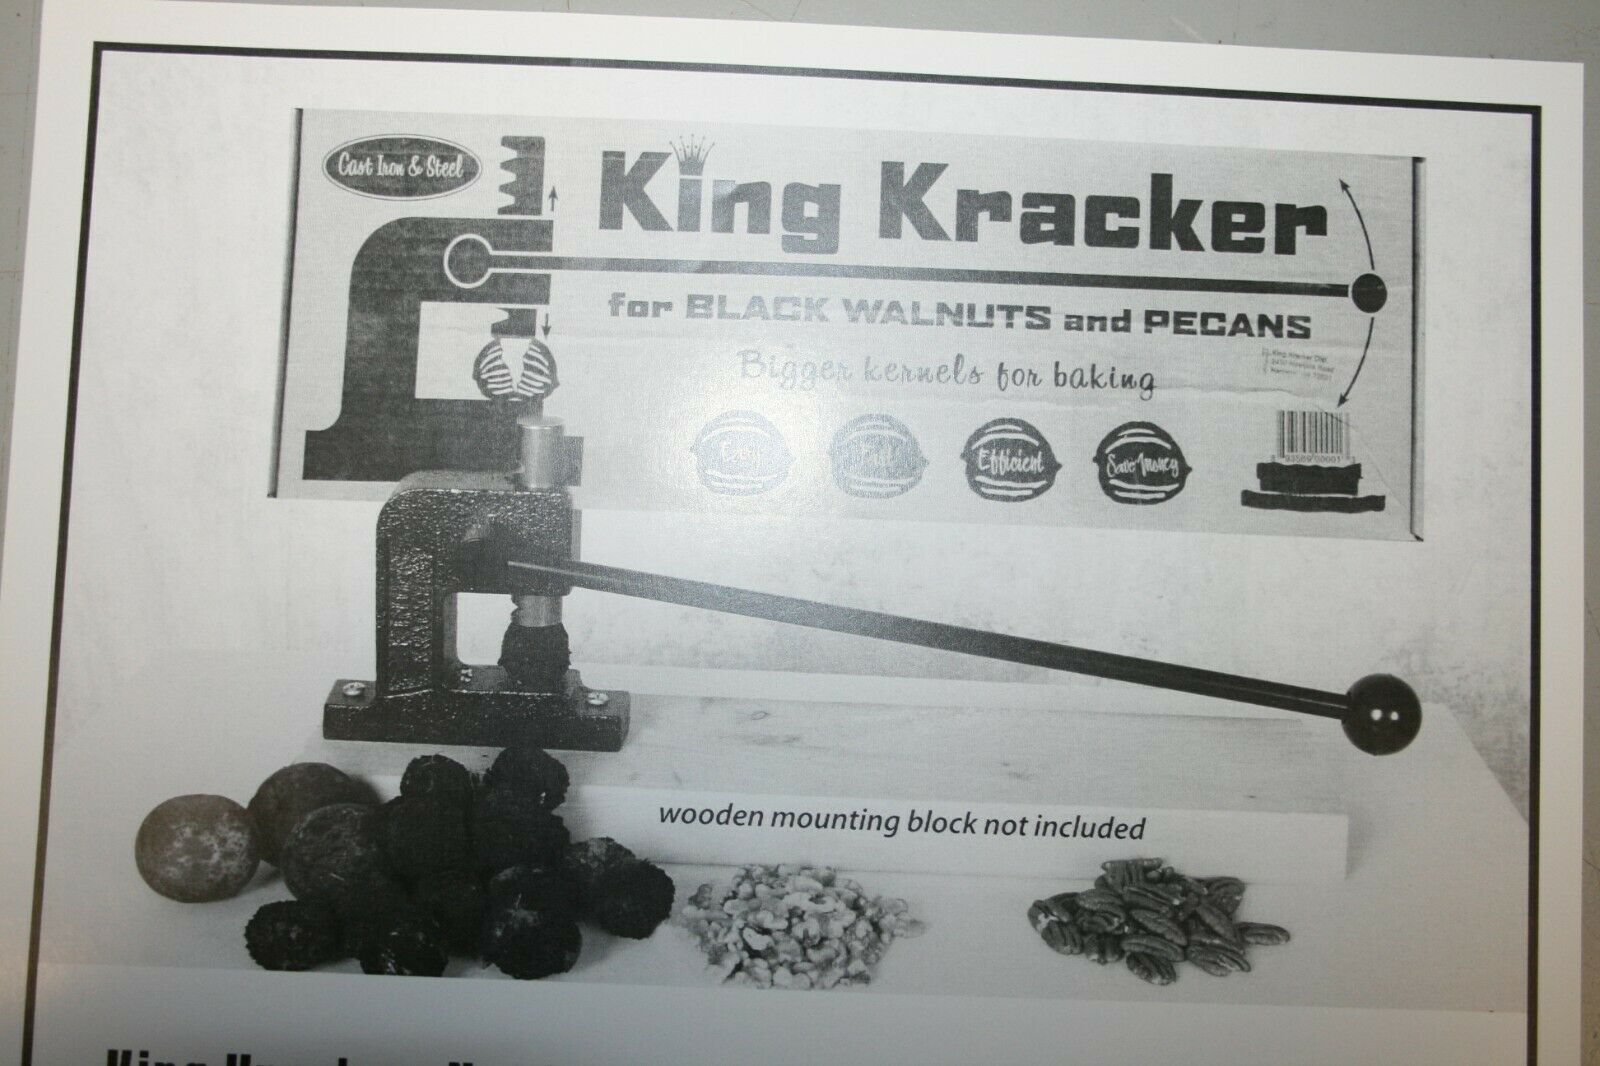 KING KRACKER PROFESSIONAL BLACK WALNUT AND PECAN NUT CRACKER